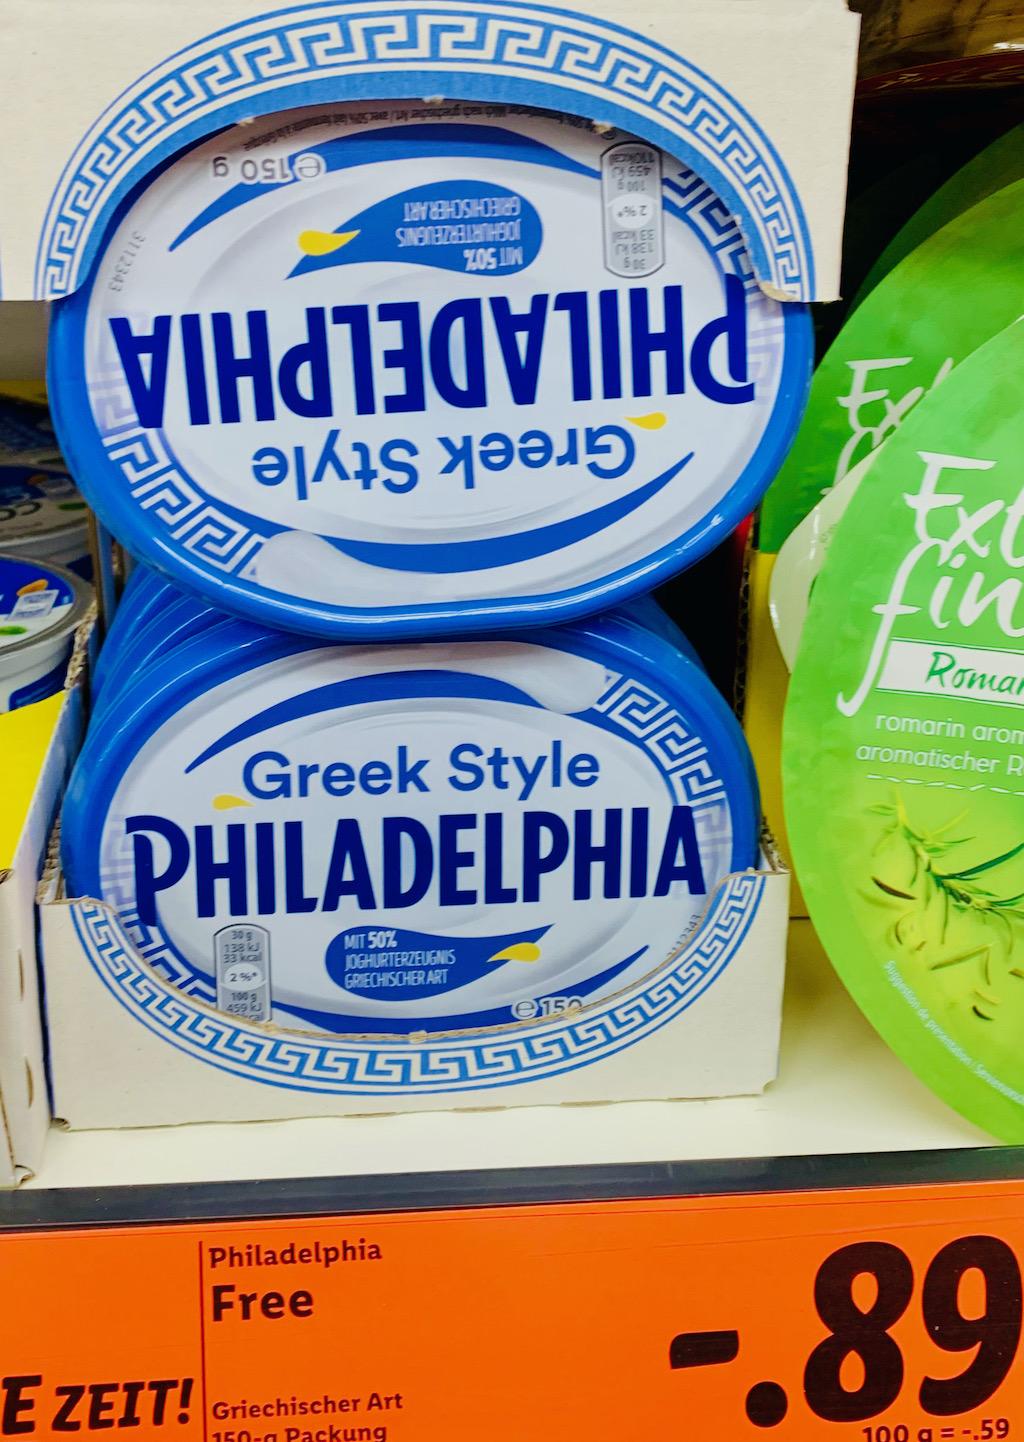 Mondelez Philadelphia Greek Style